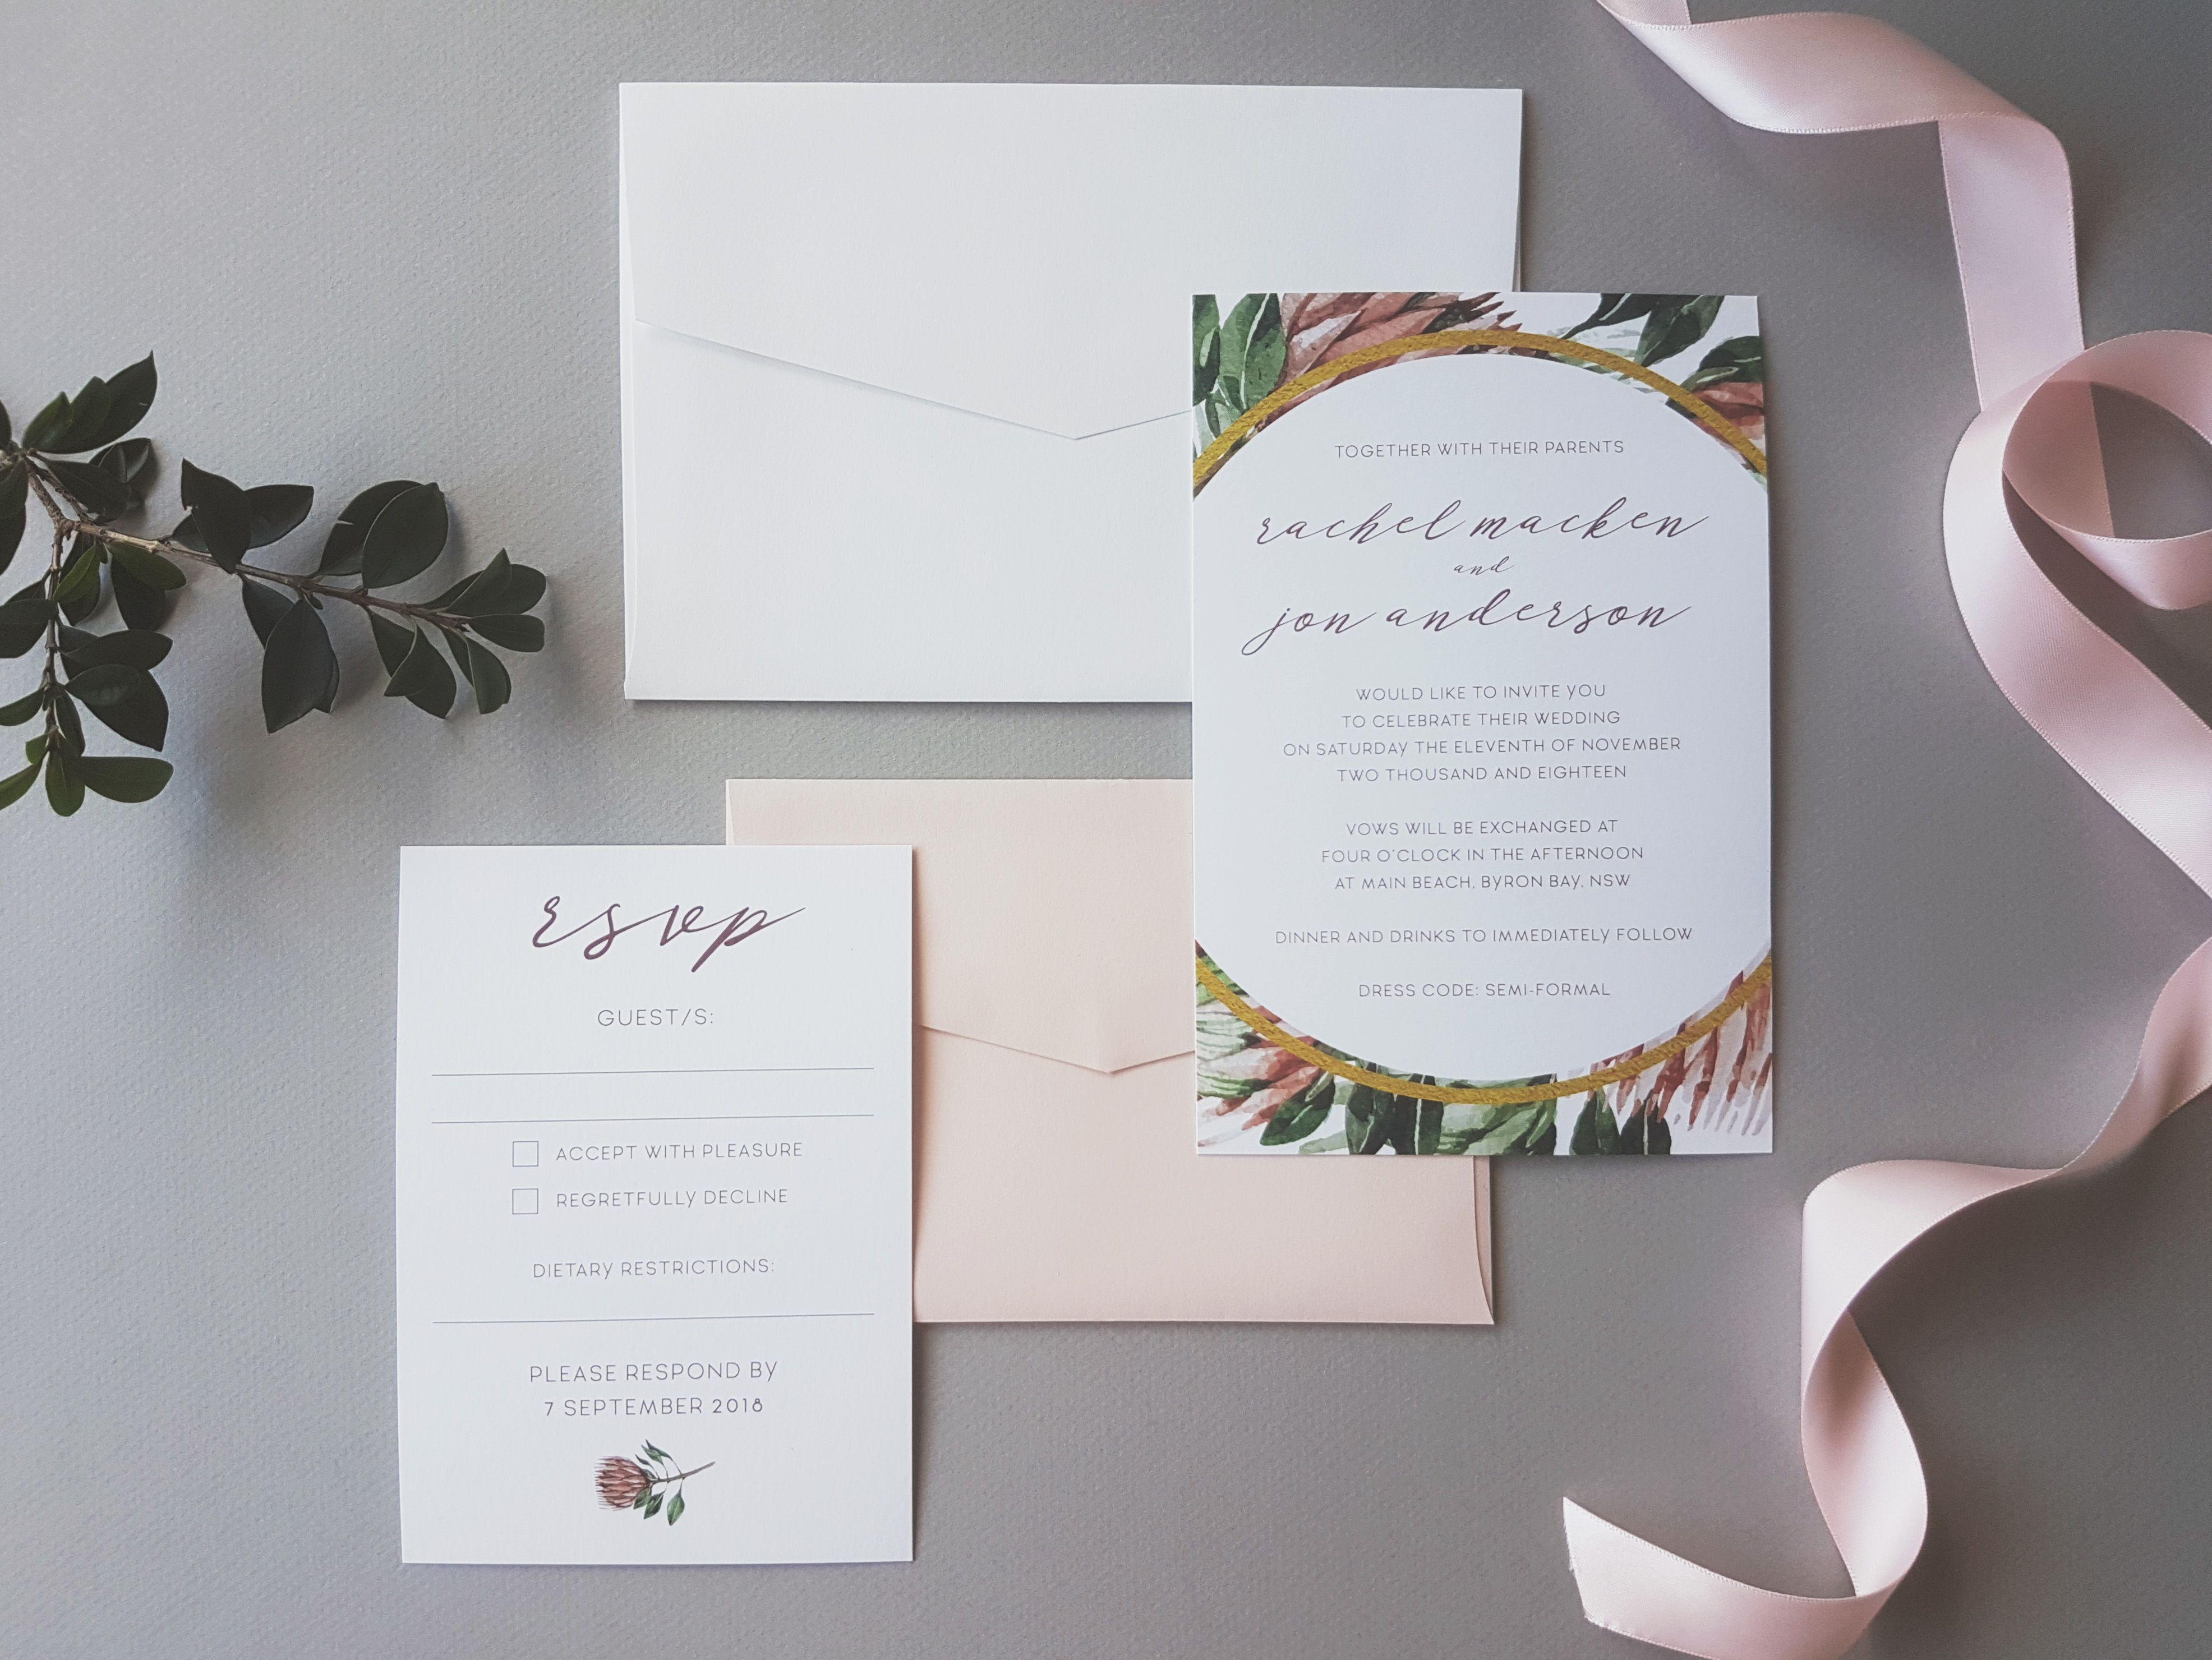 Perfect Wedding Invites Sale Elaboration - Invitations Design ...